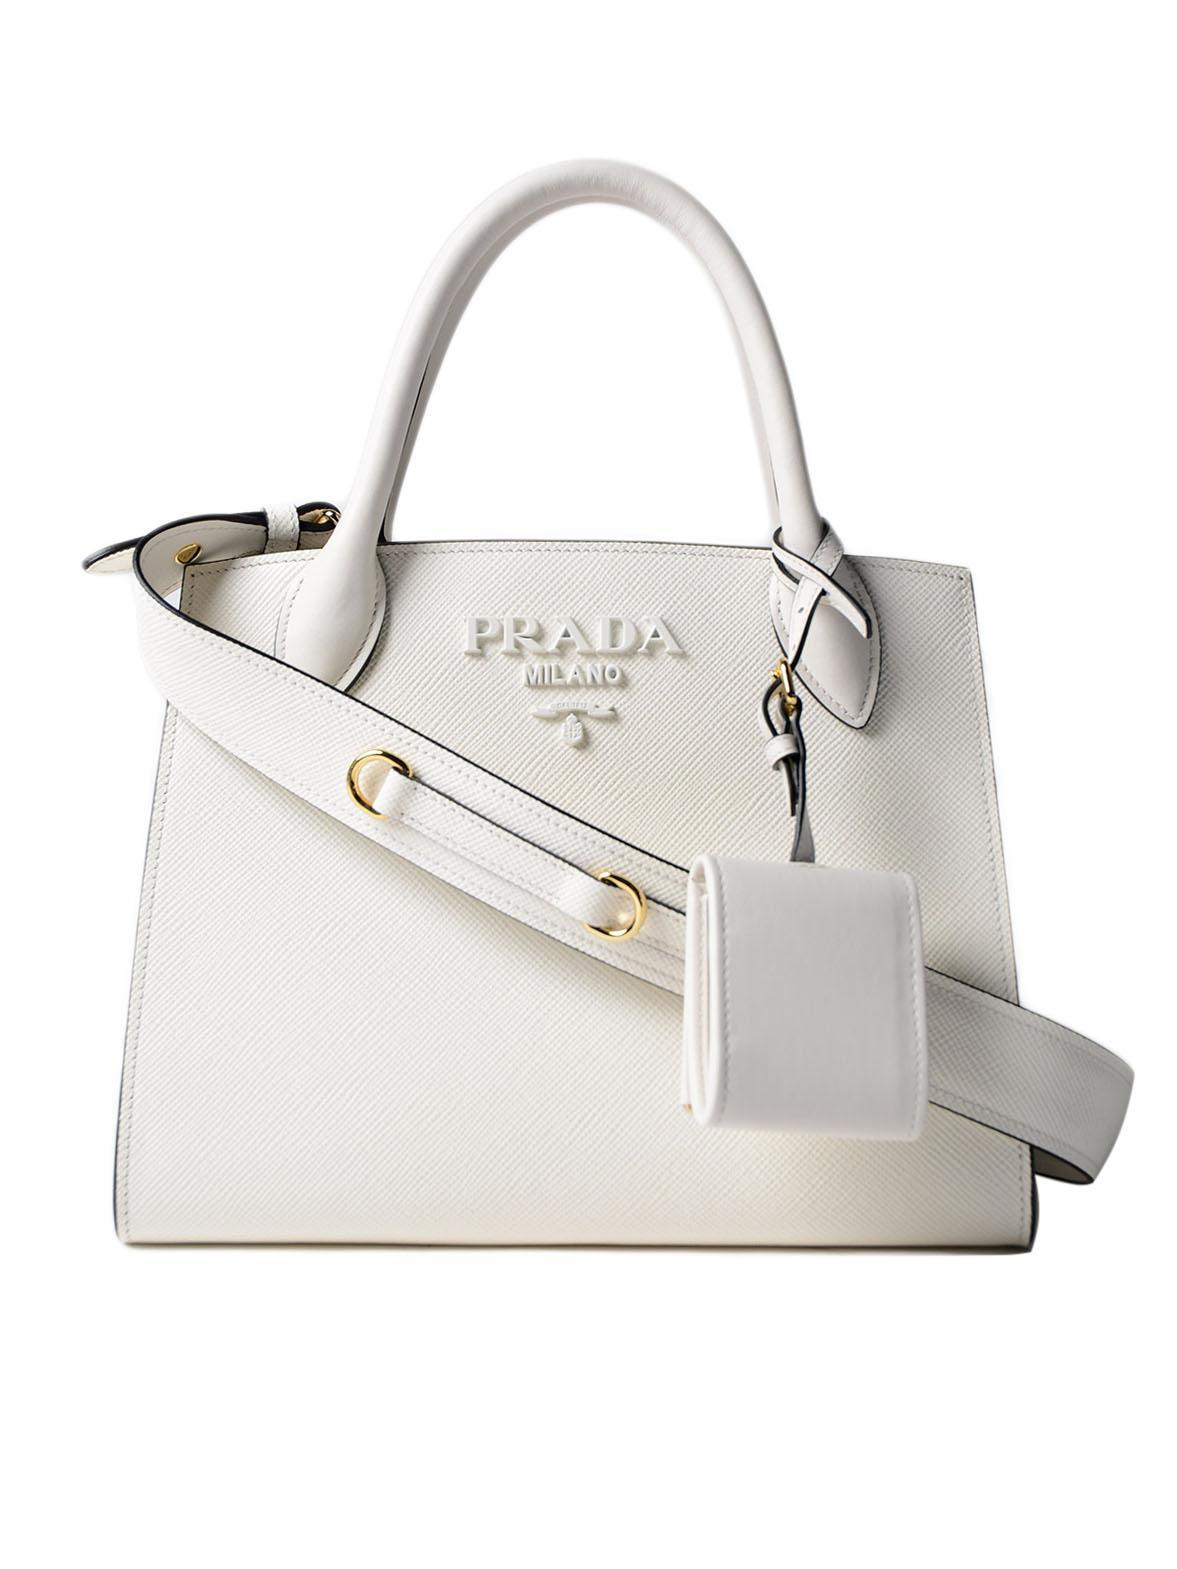 23bdc6092d89 Prada Monochrome Handbag - Lyst